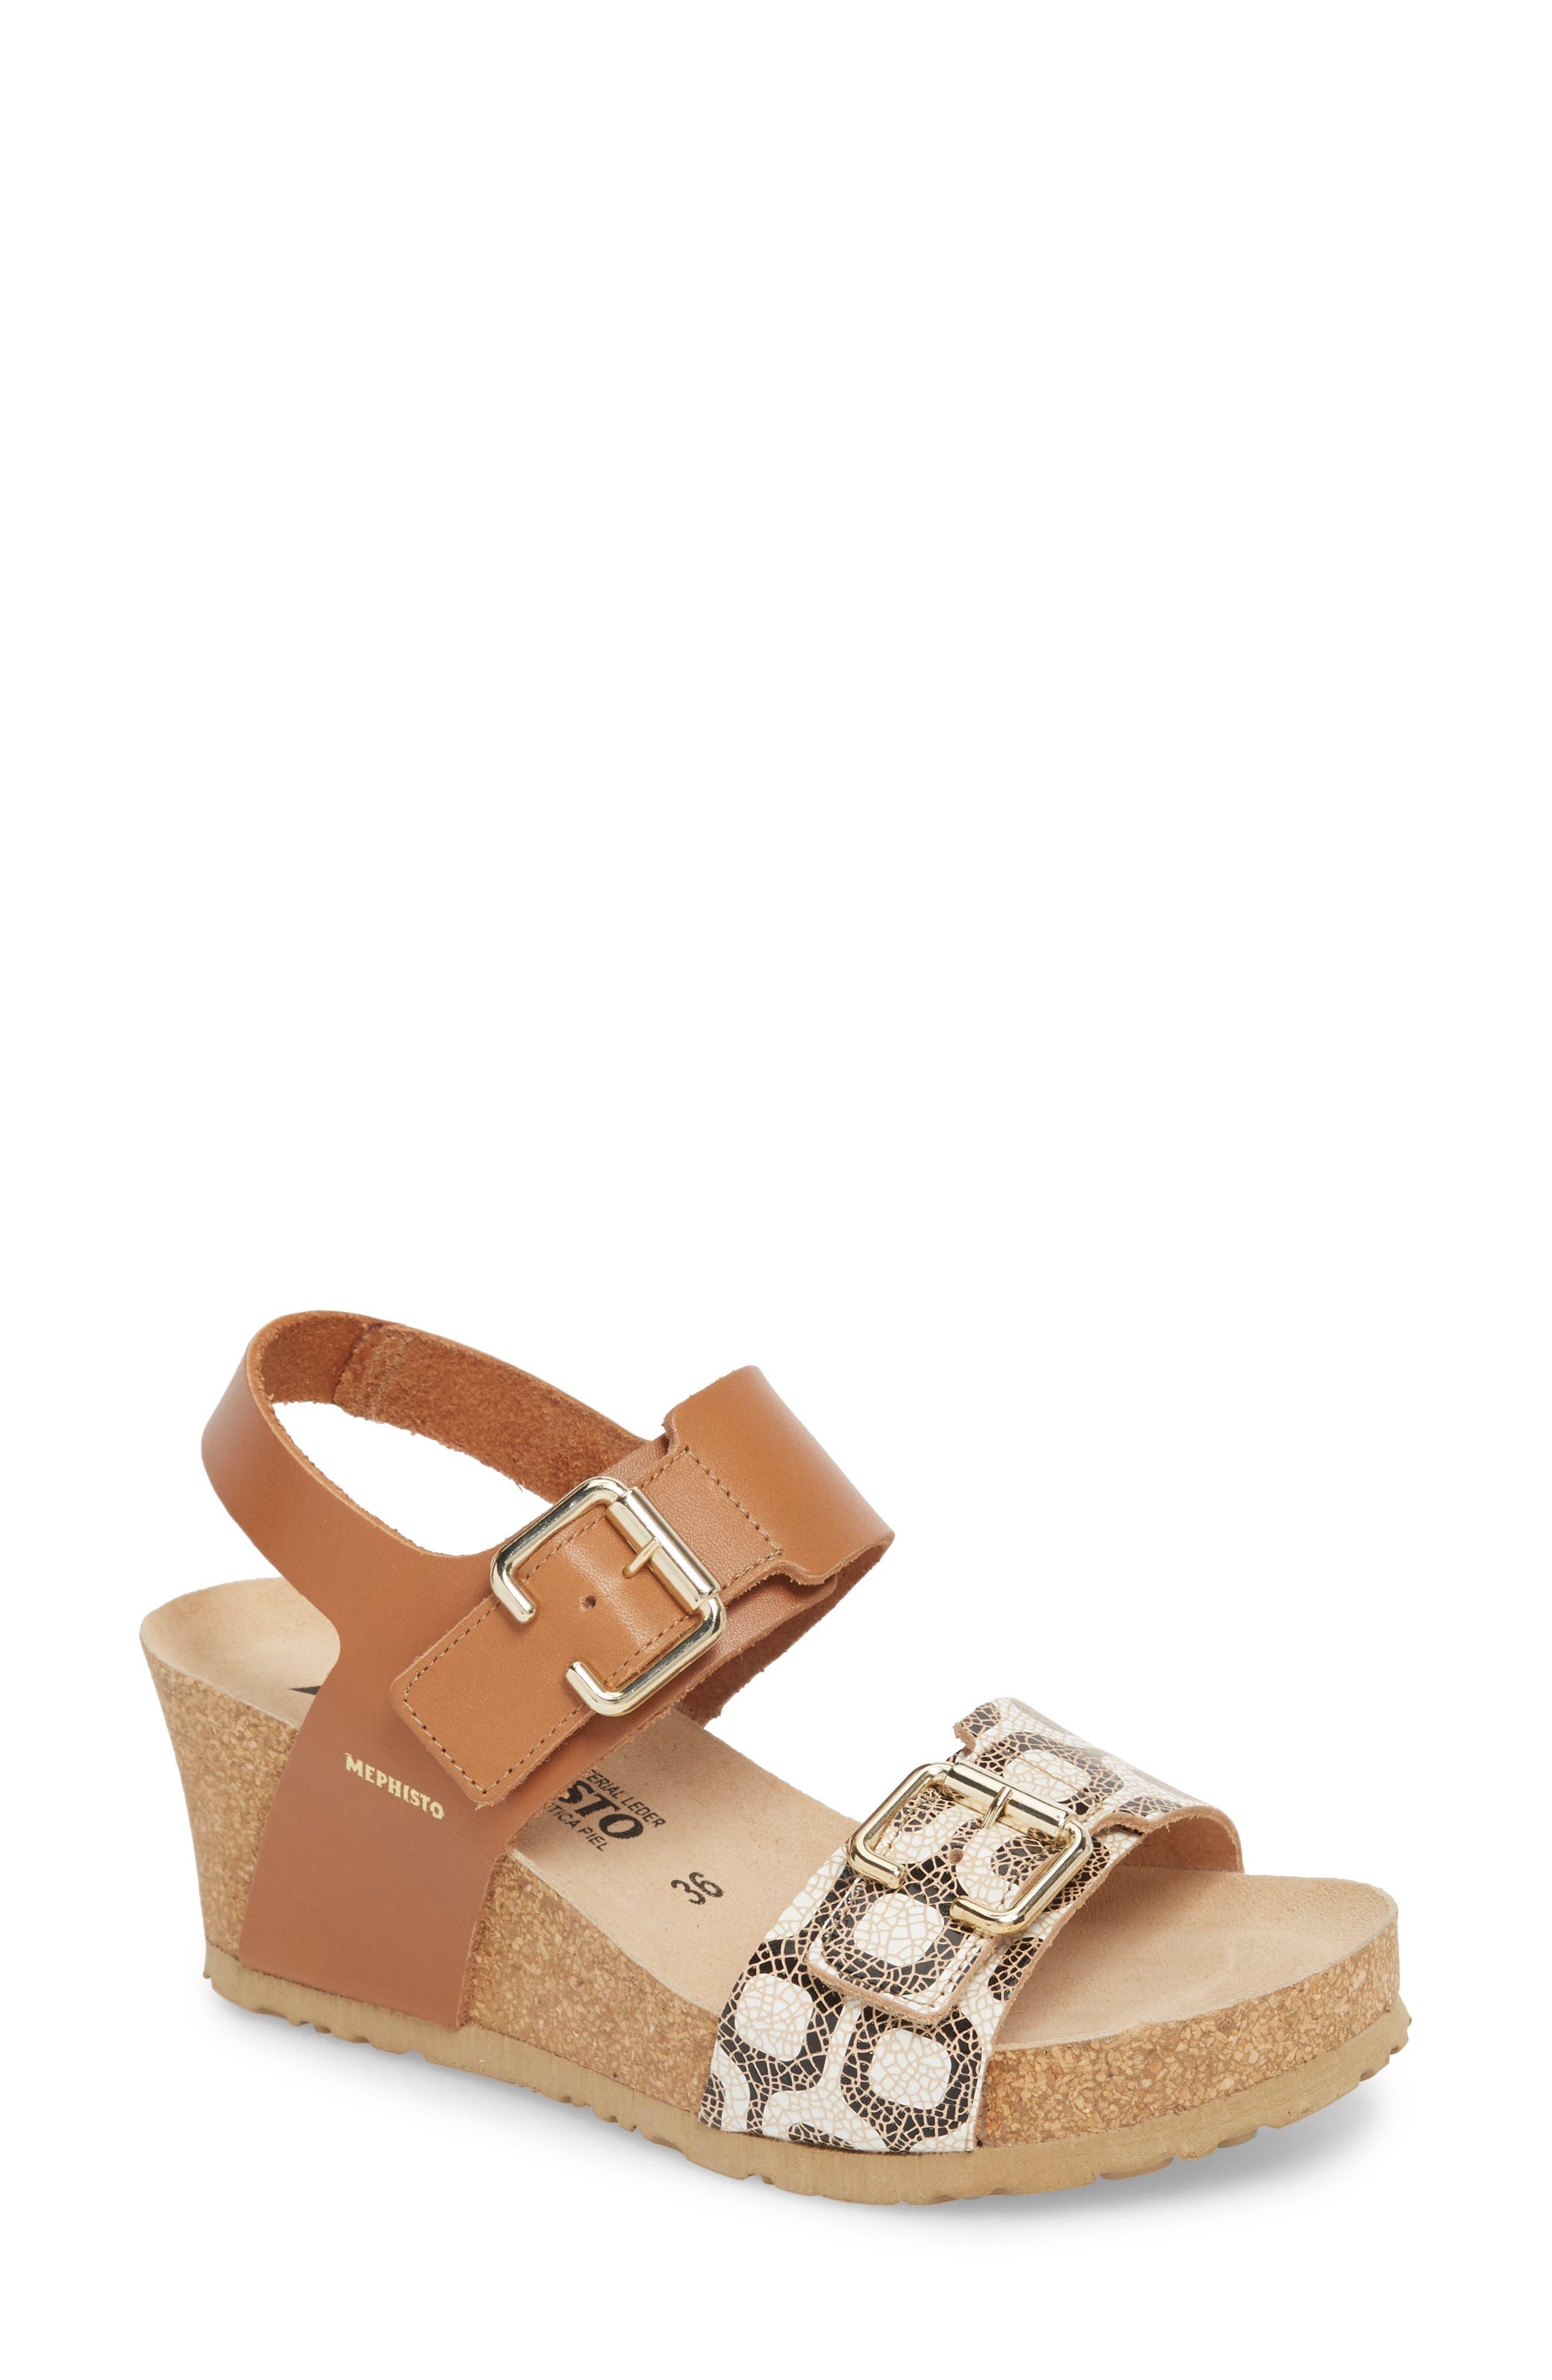 Sale Women Mephisto Lamia Oxblood Texas boots Yx Rrp K0P